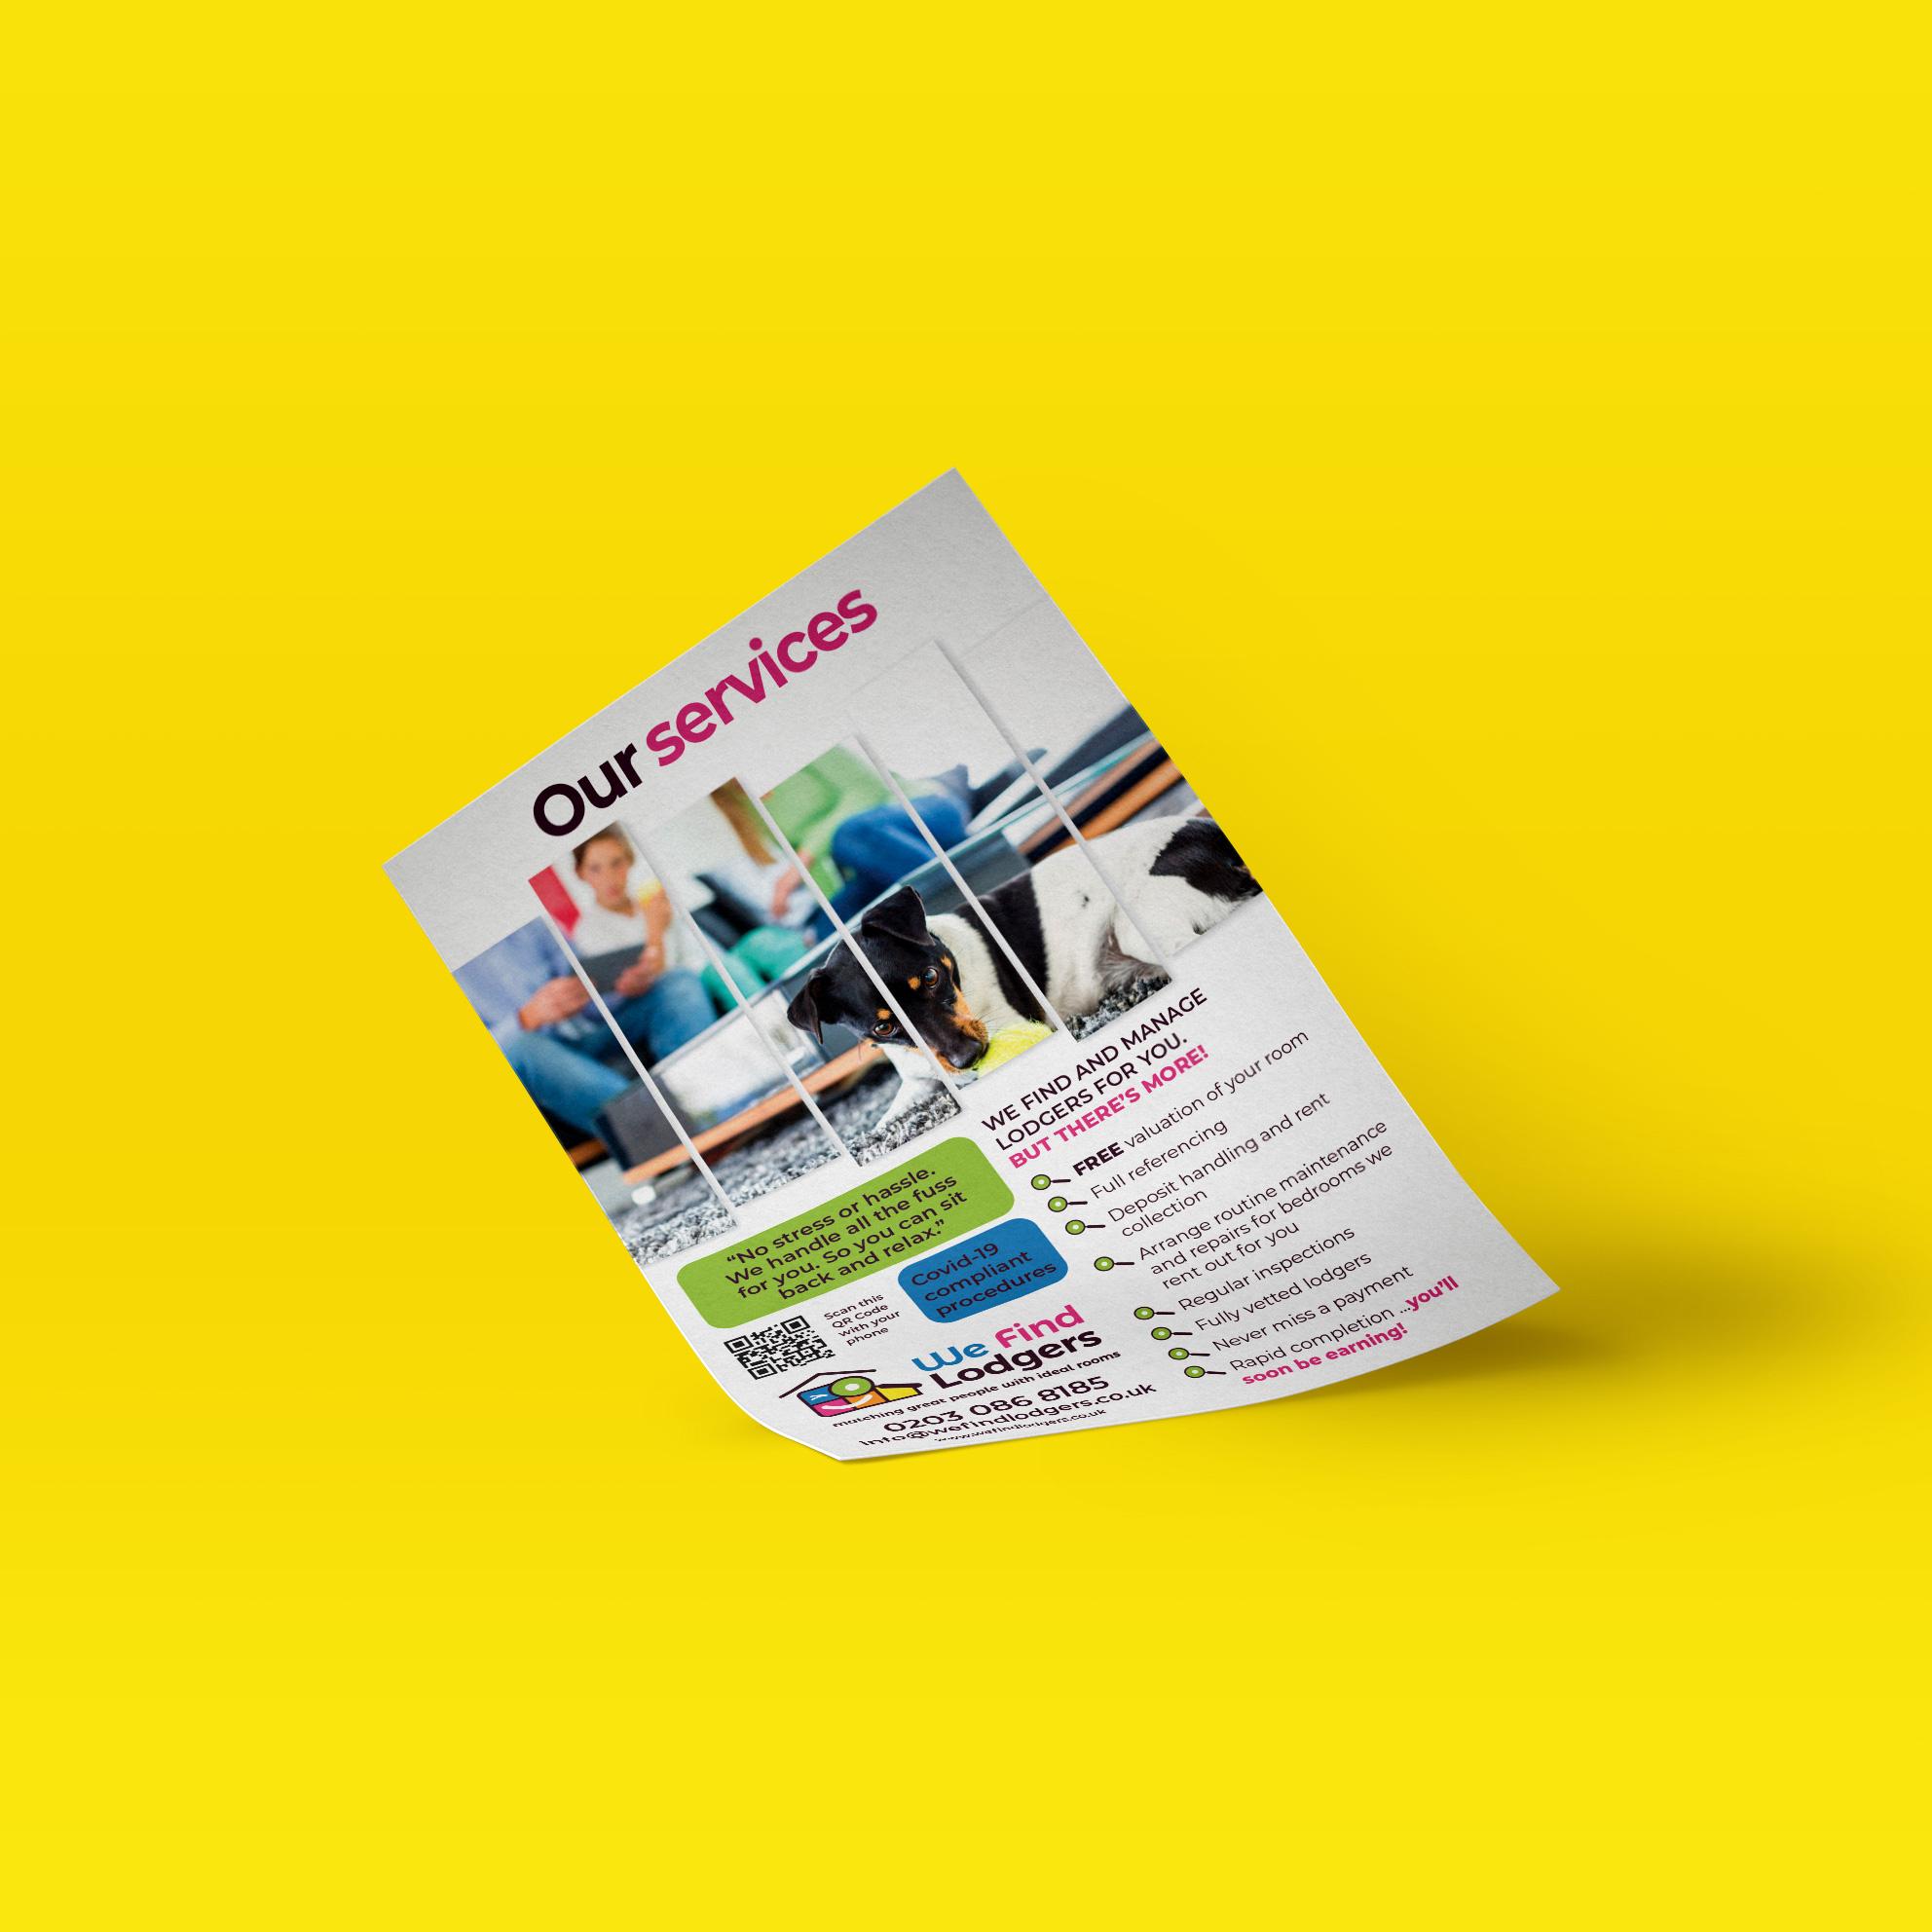 Graphic Design, Design and Print, Brand Identity Development